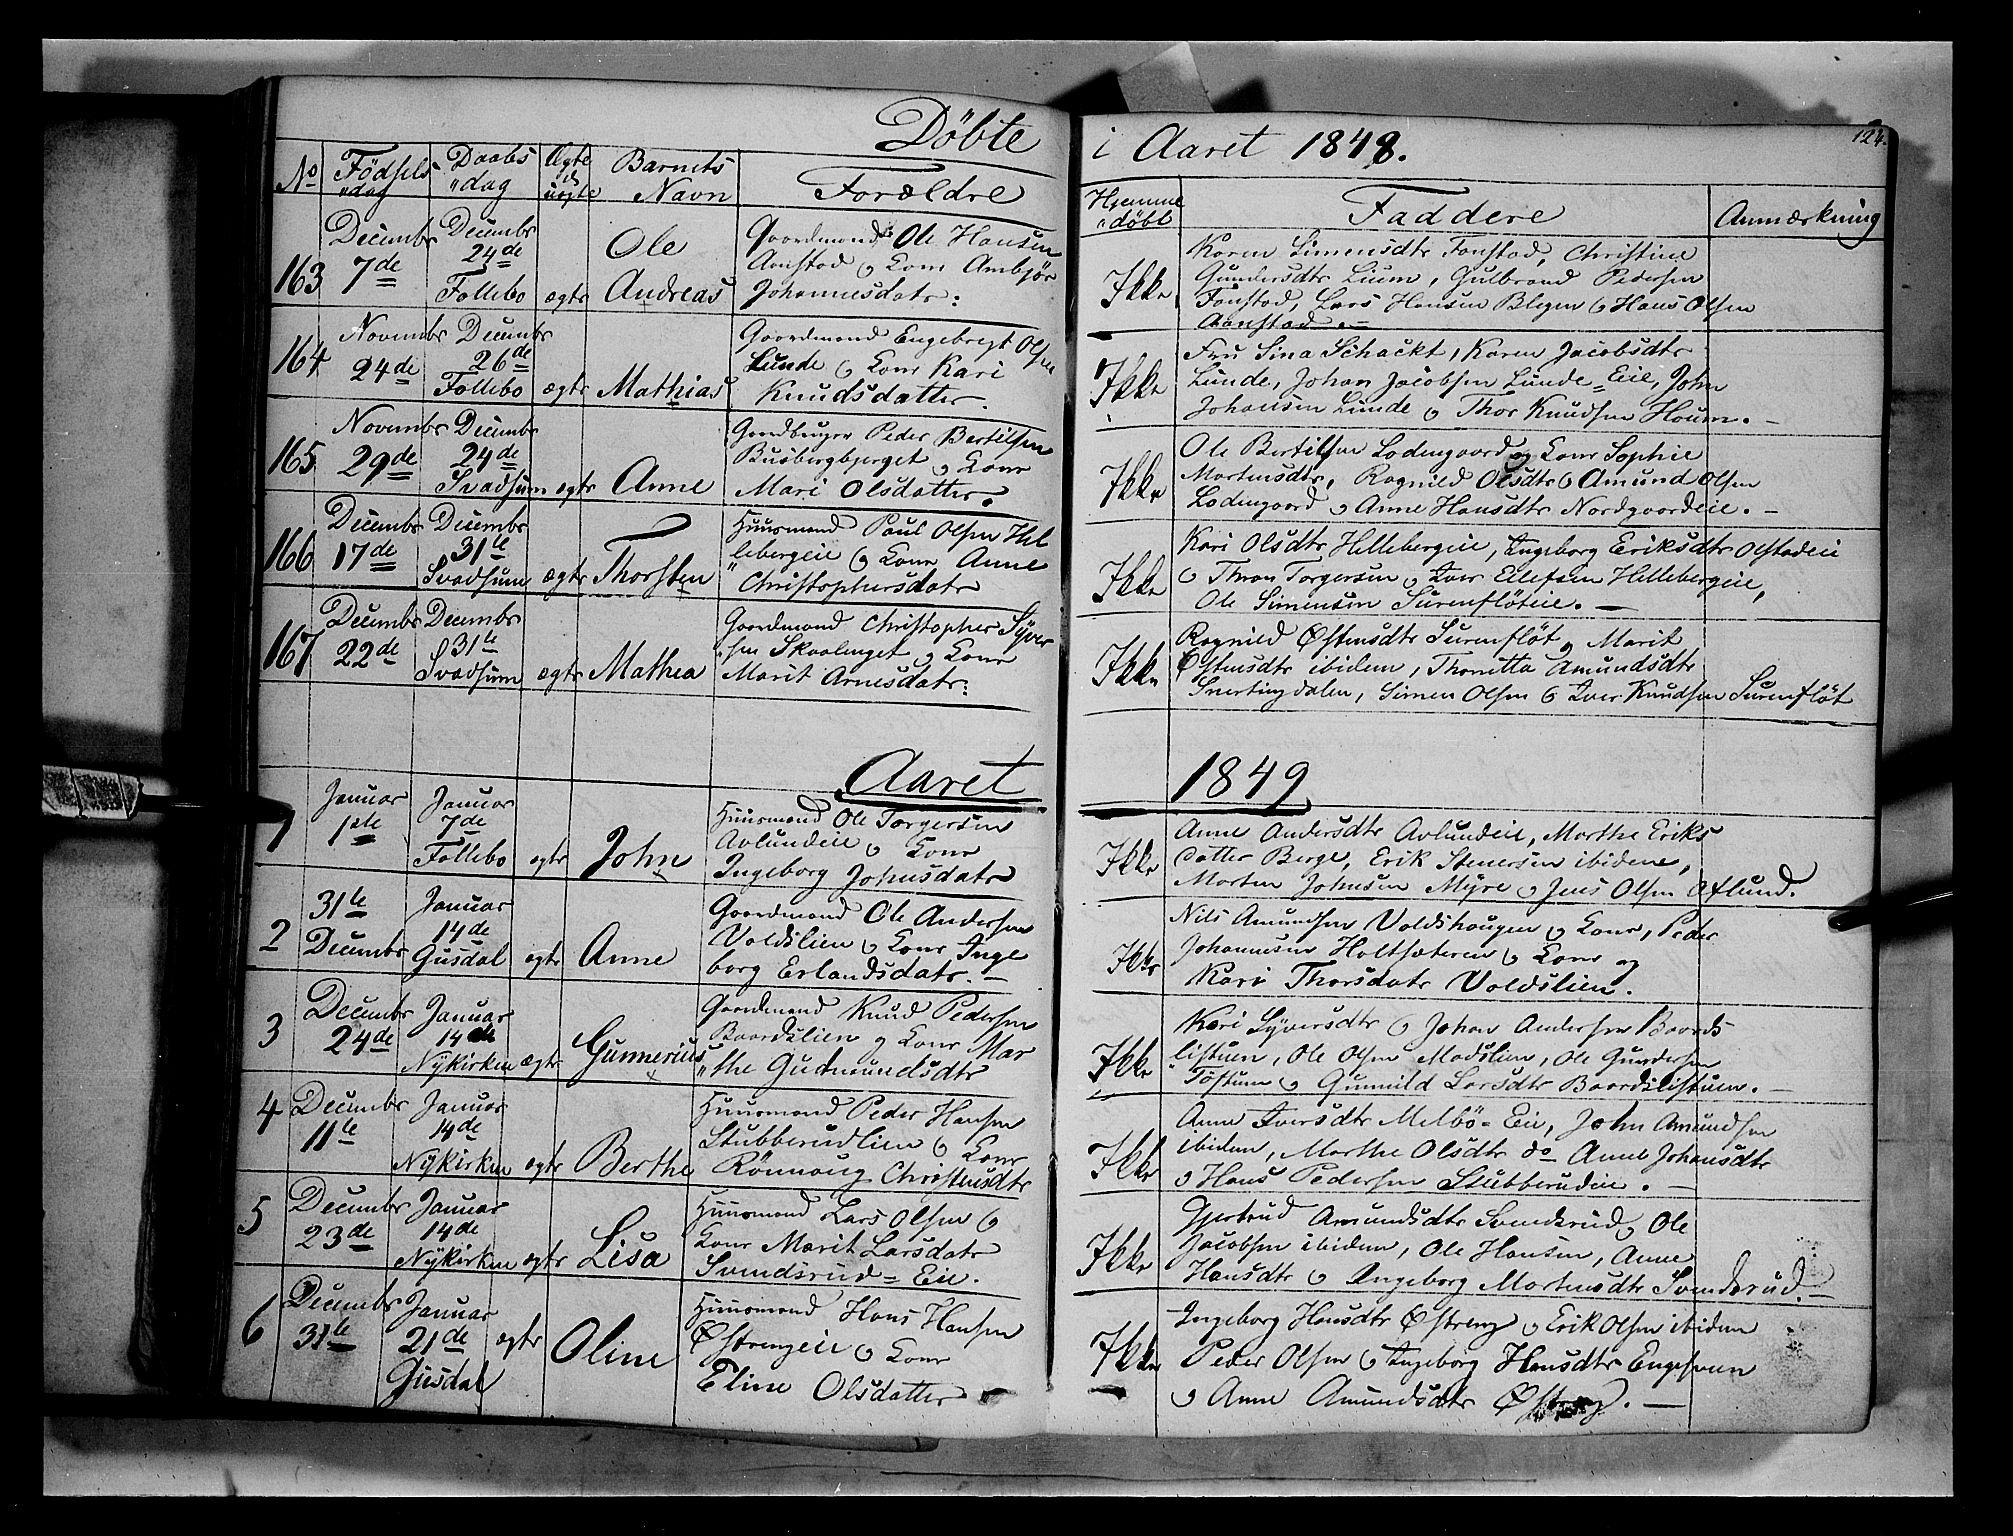 SAH, Gausdal prestekontor, Ministerialbok nr. 7, 1840-1850, s. 124